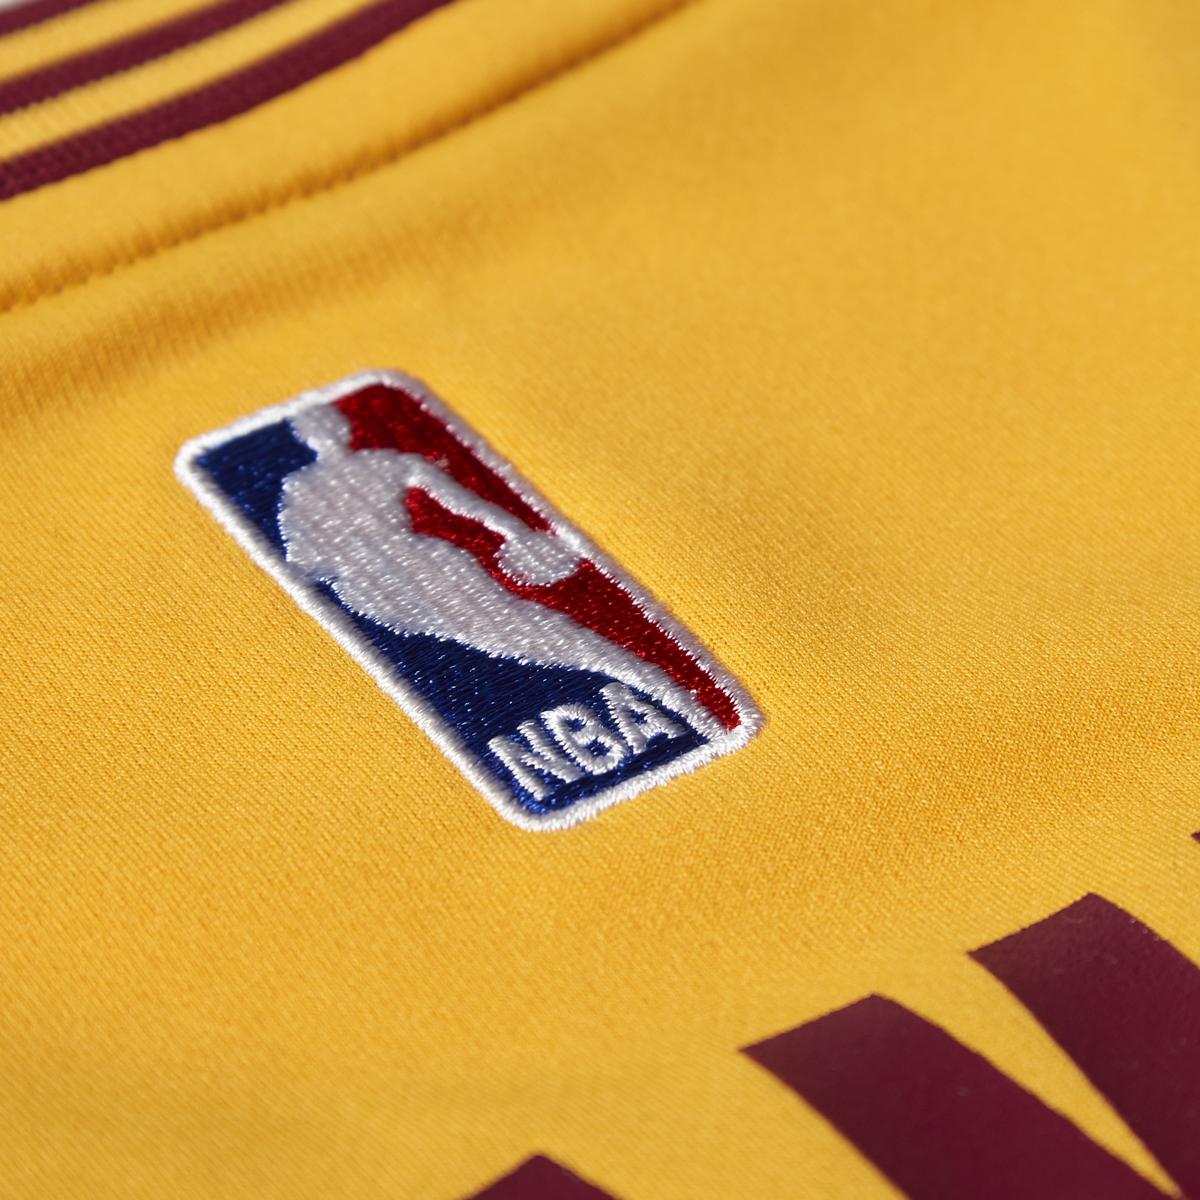 Adidas NBA Replica Cleveland LeBron James #23 Jersey - A61198